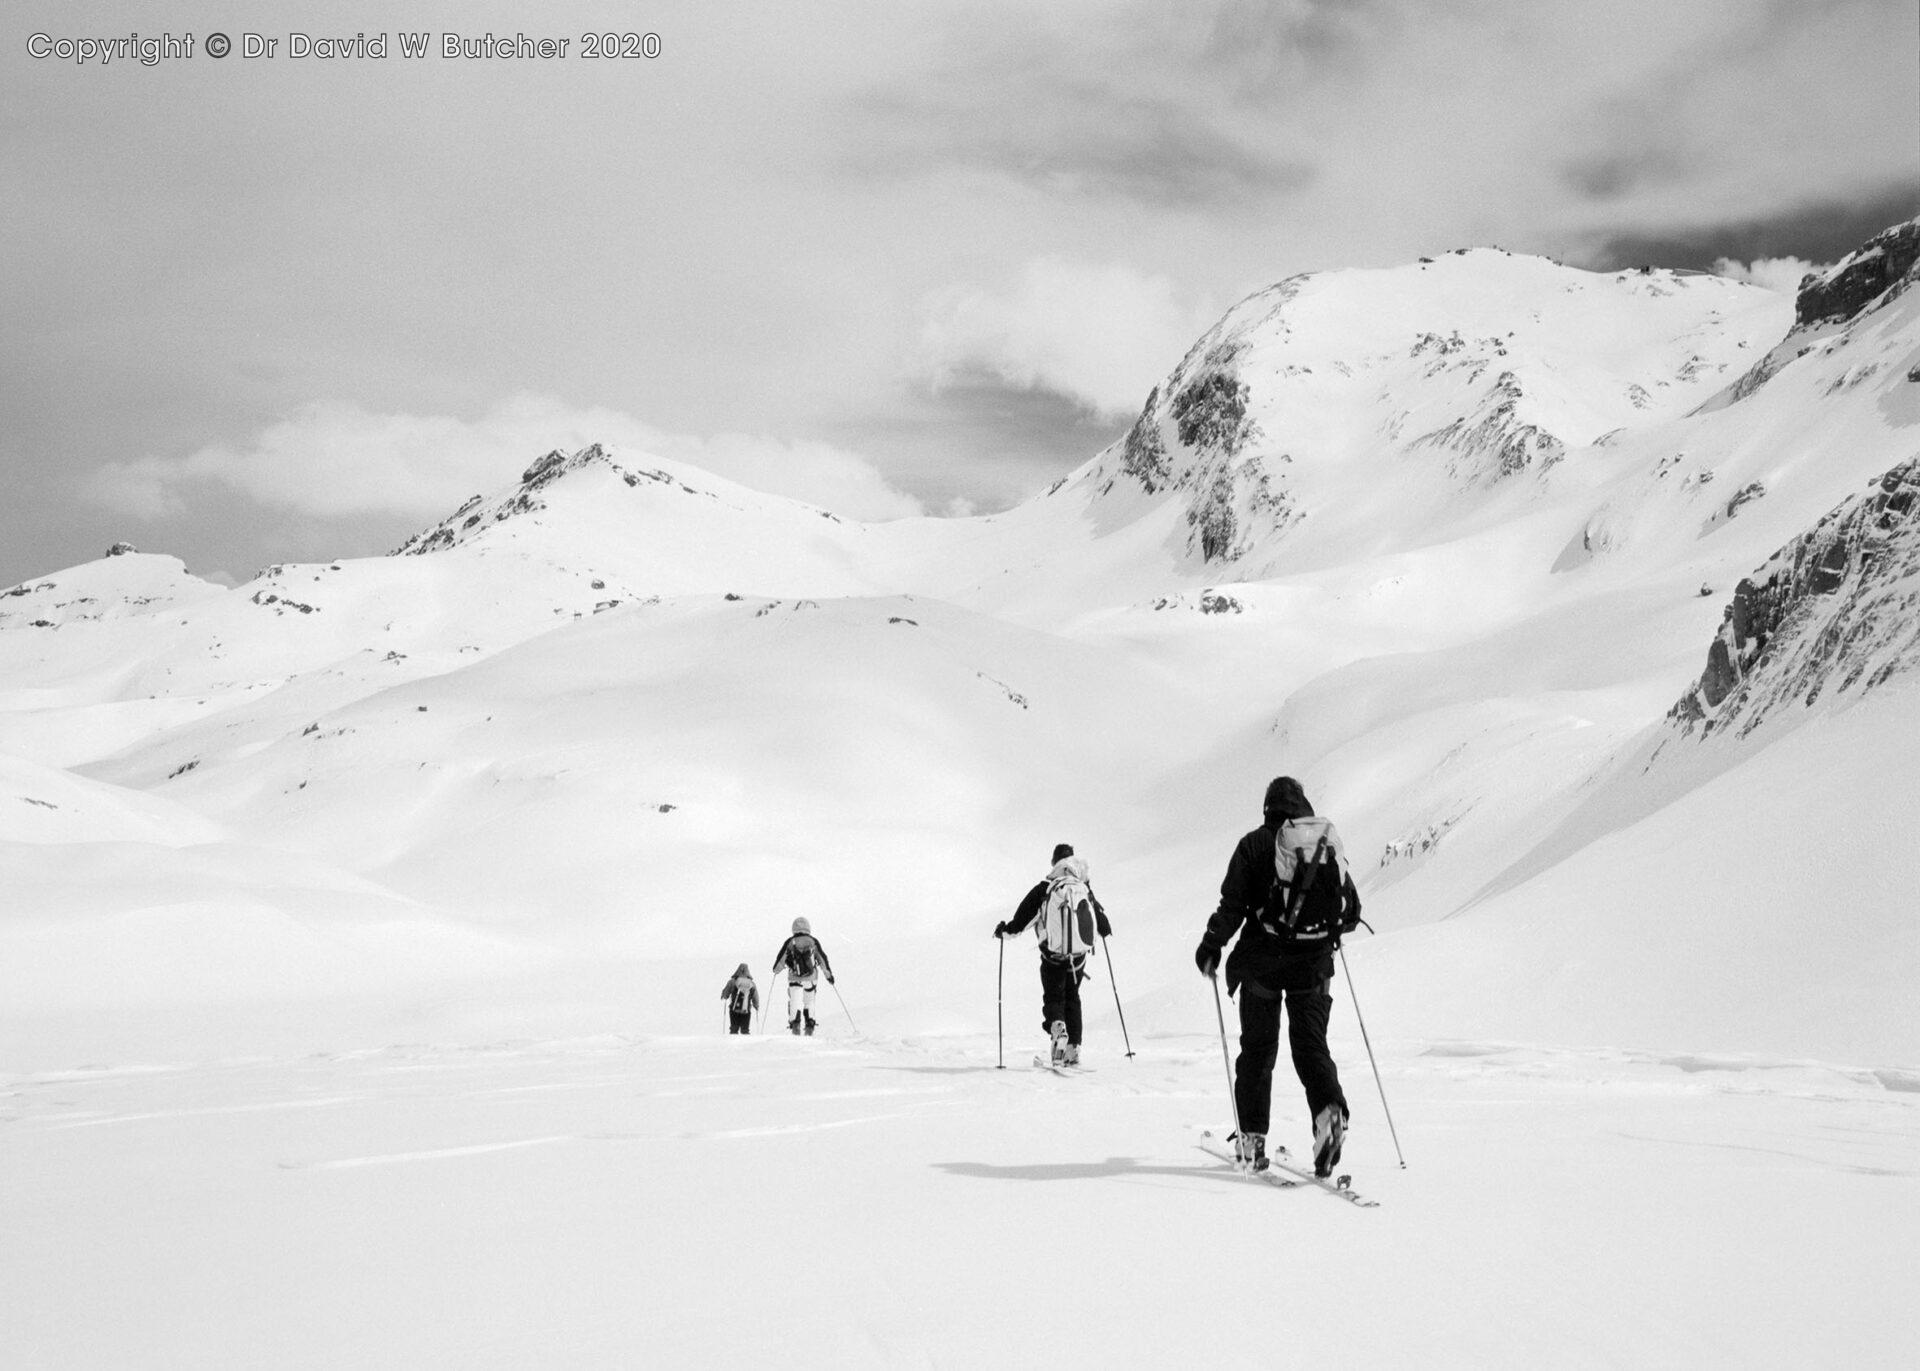 Crans Montana Crossing Plaine Morte, Switzerland